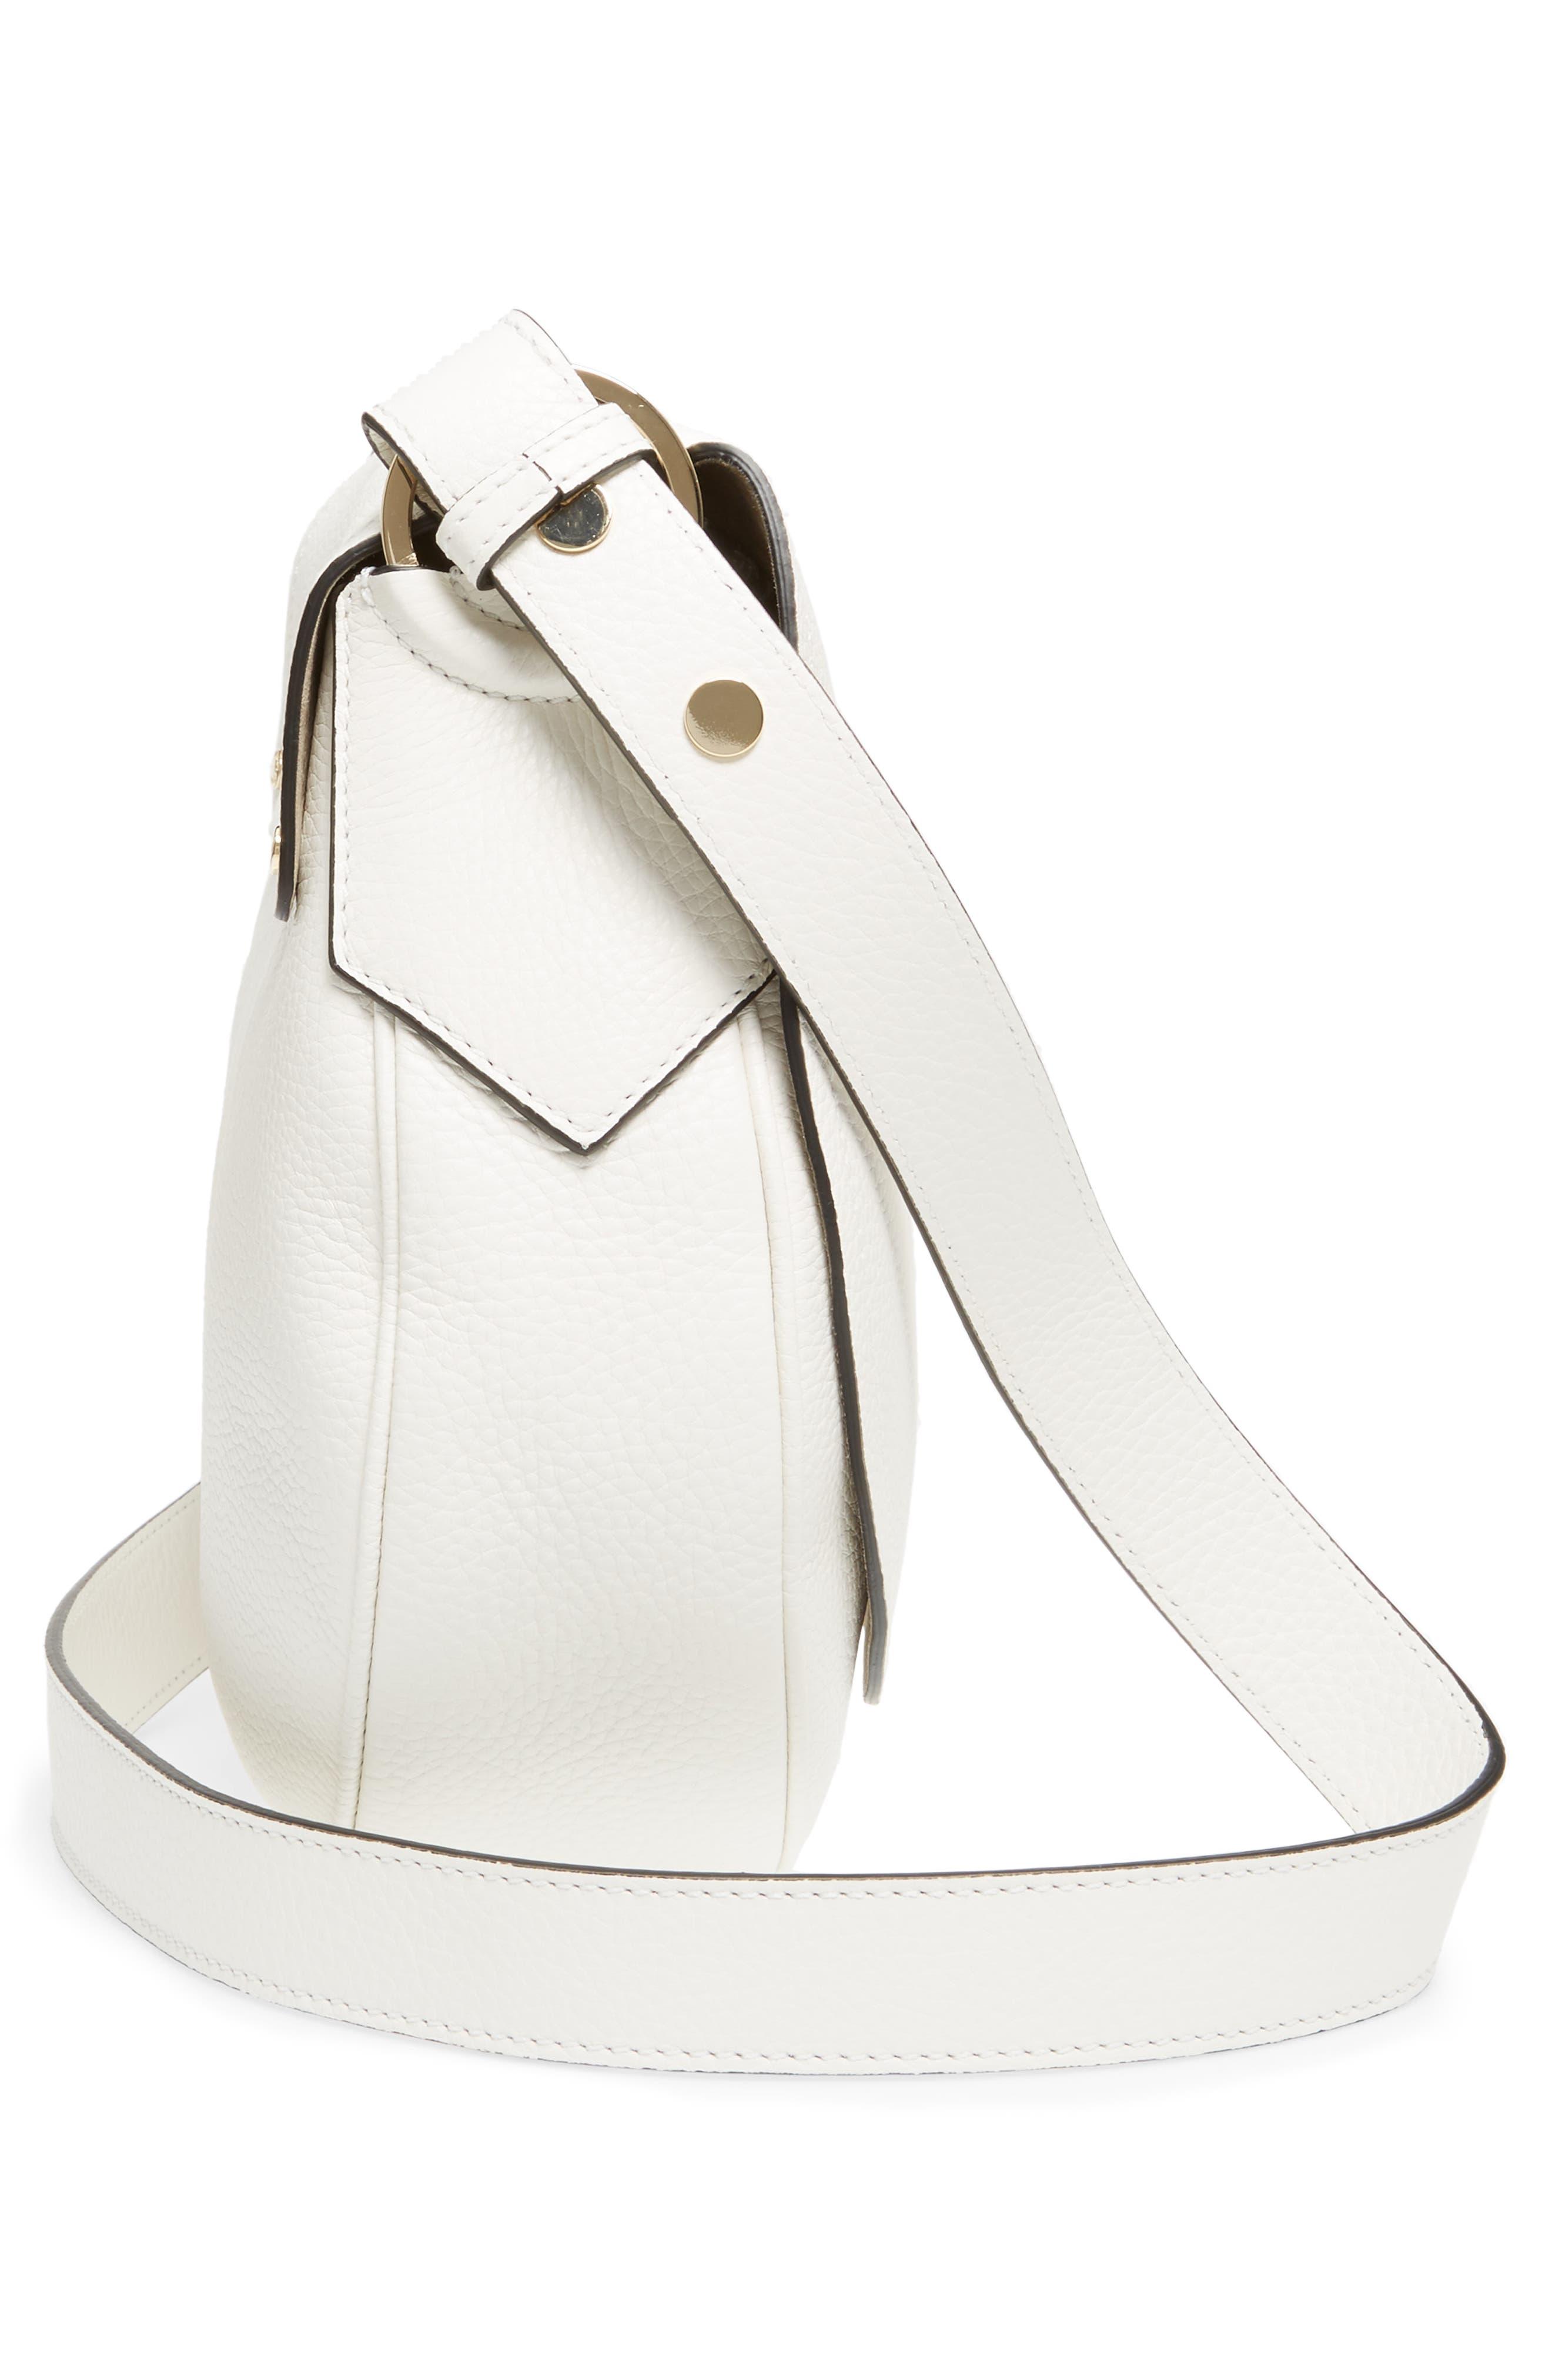 Small Valeria Leather Crossbody Bag,                             Alternate thumbnail 14, color,